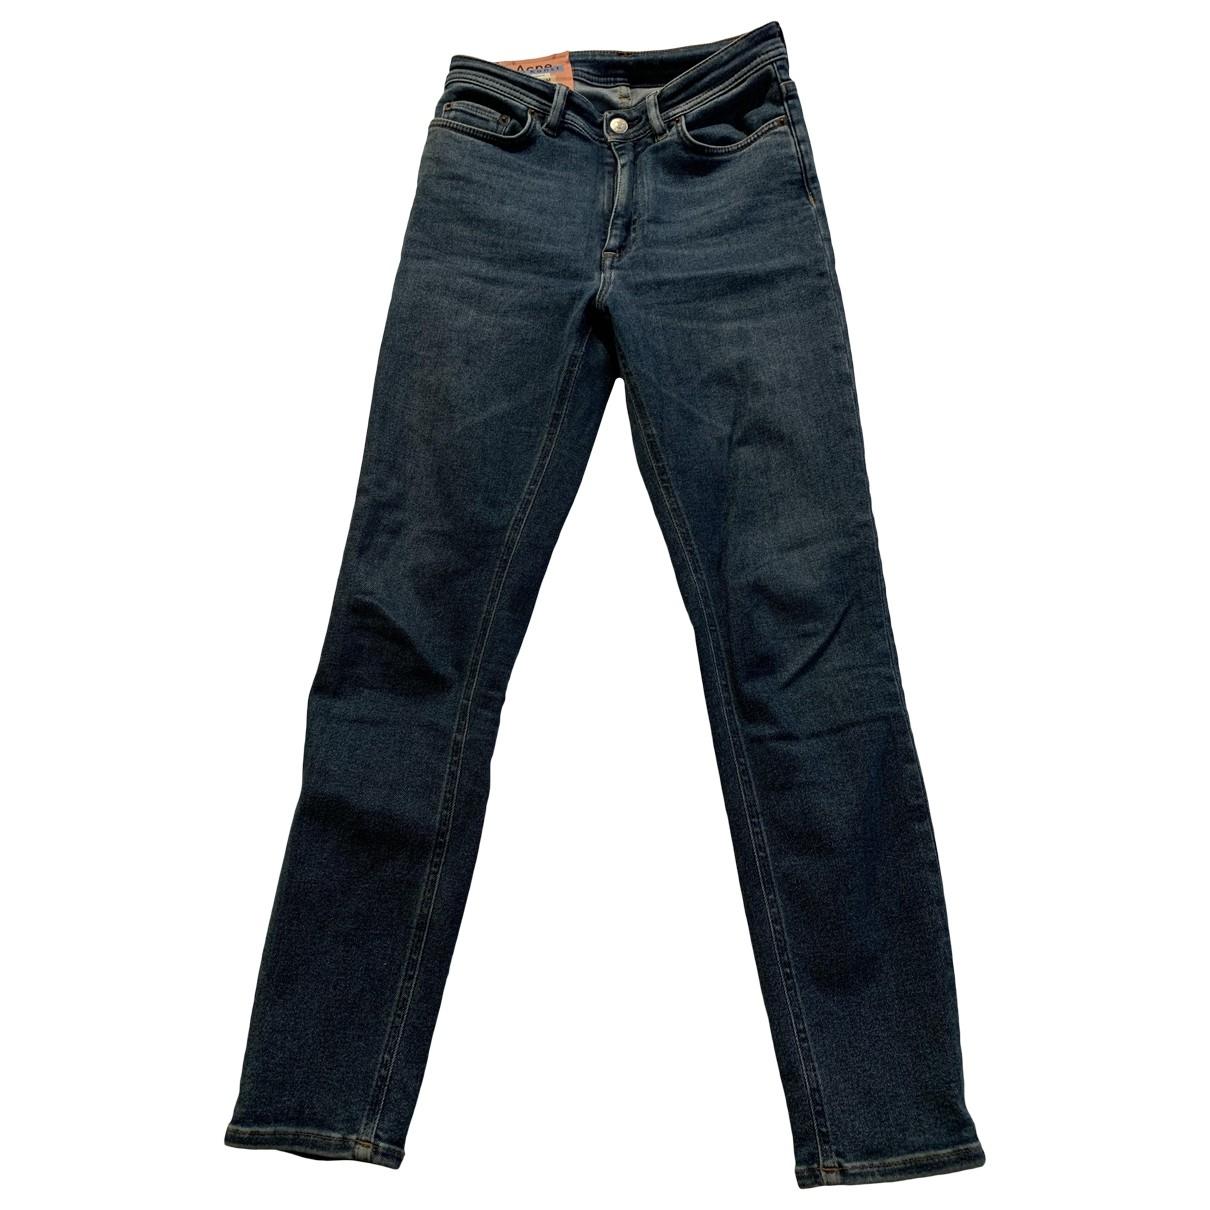 Acne Studios \N Blue Denim - Jeans Jeans for Women 36 FR